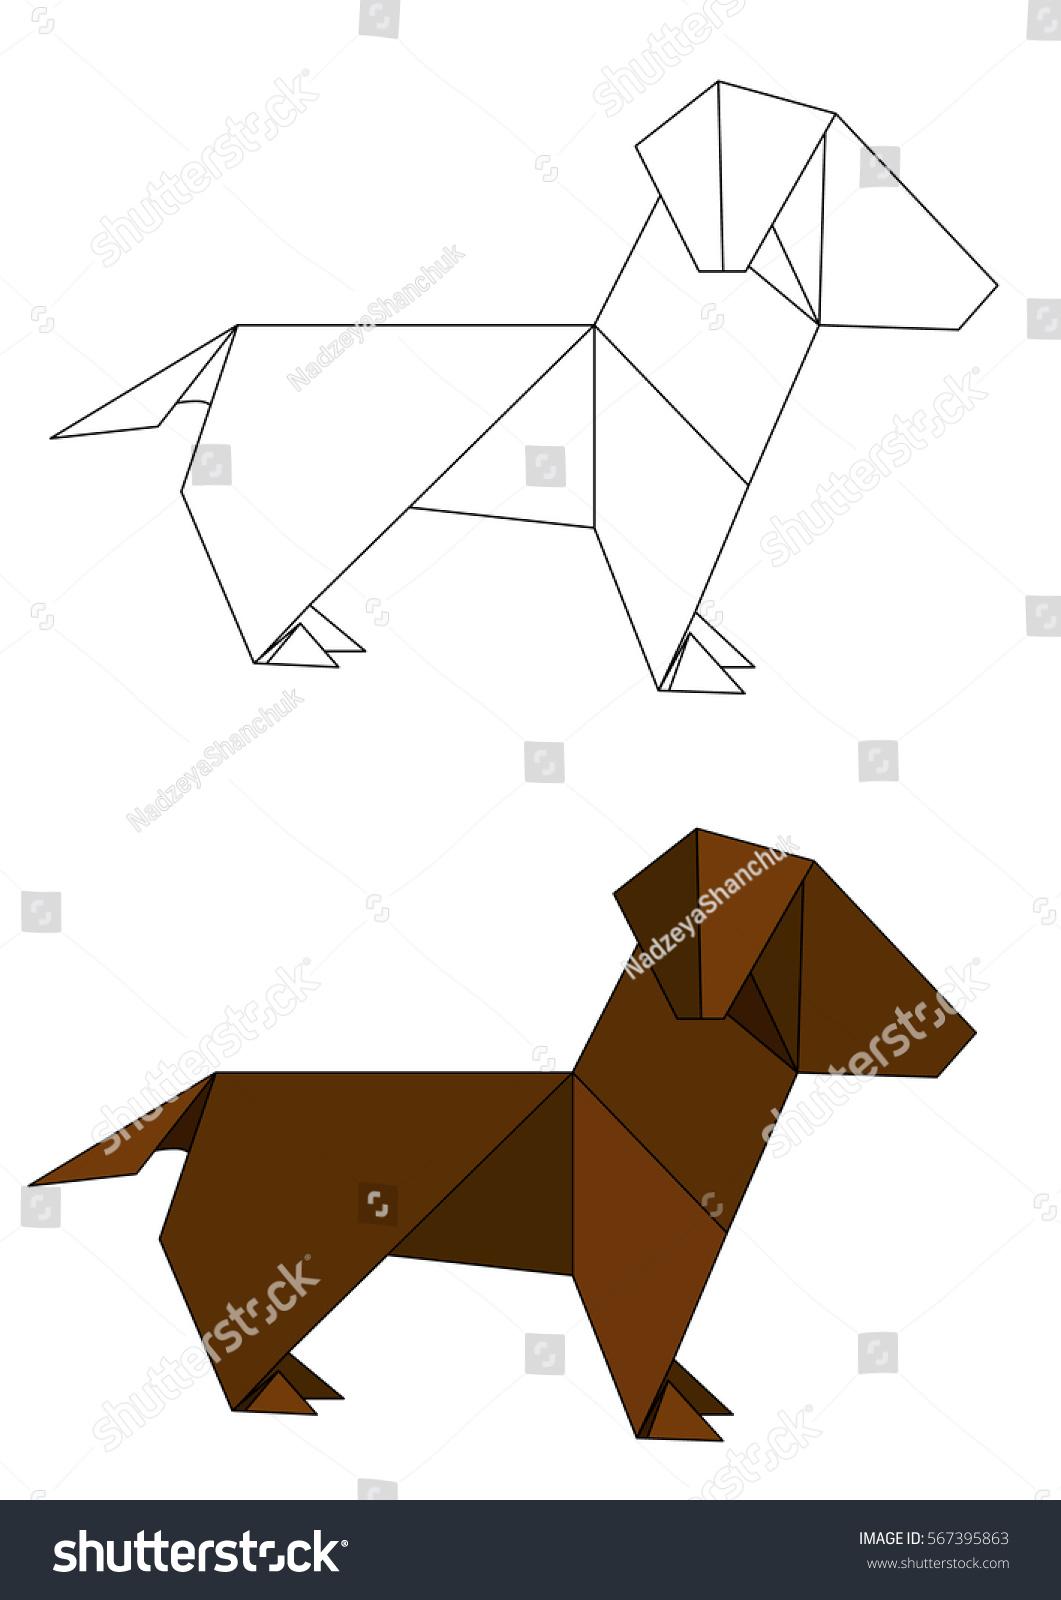 Origami Paper Dog Contours